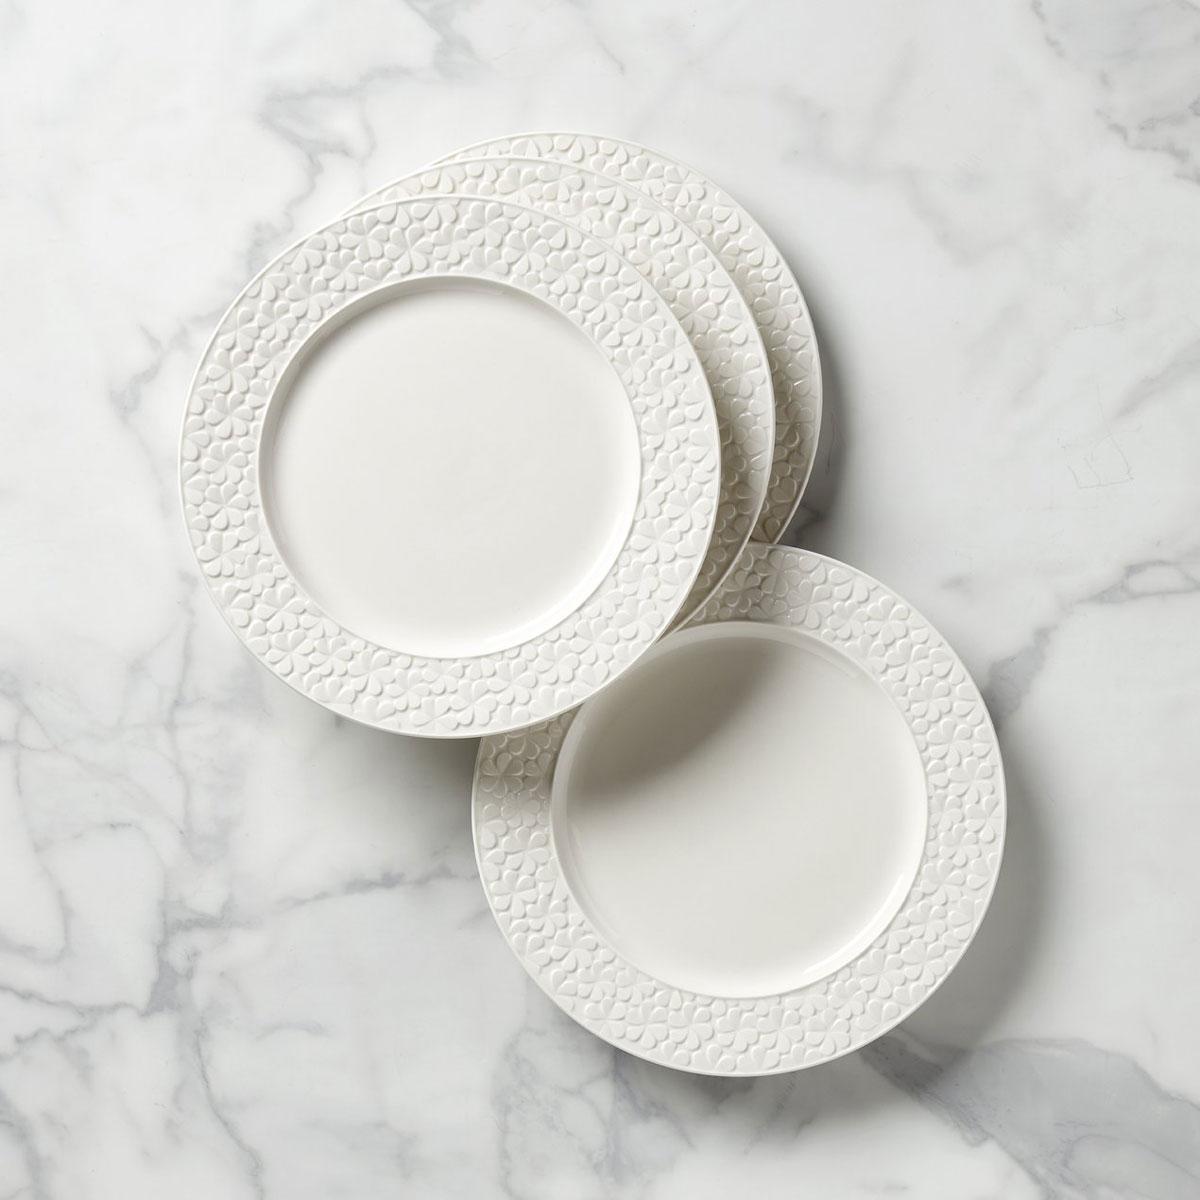 Kate Spade New York, Lenox Blossom Lane 4-Piece Dinner Plate Set